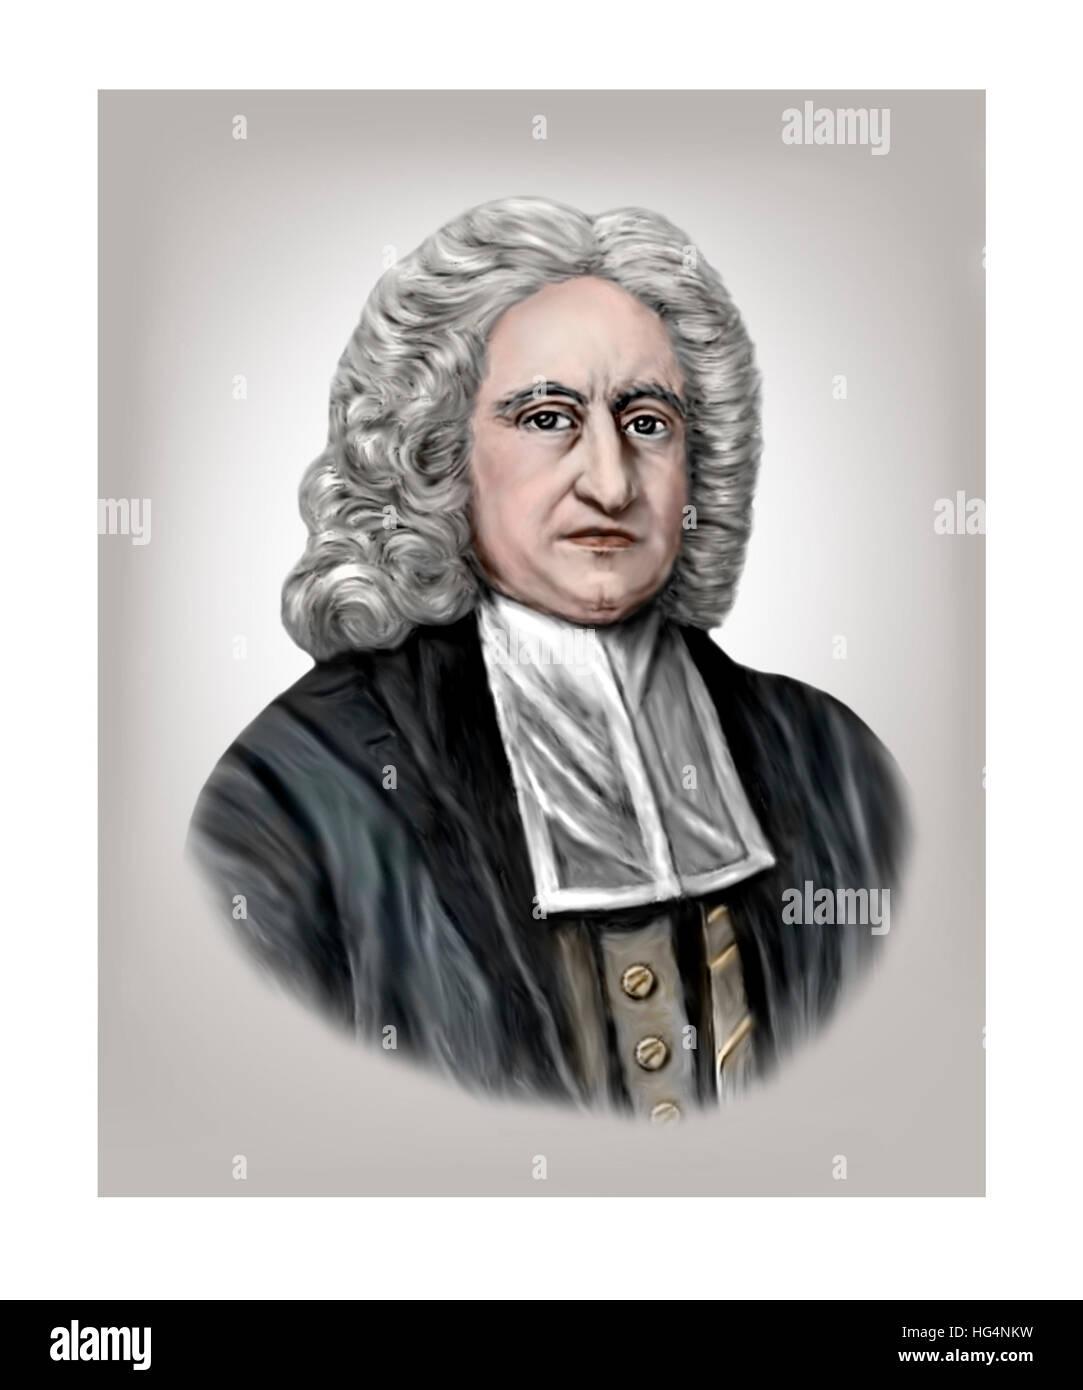 Edmond Halley, 1656-1742, Astronomer, Mathematician, Geophysicist, Meteorologist, Physicist - Stock Image